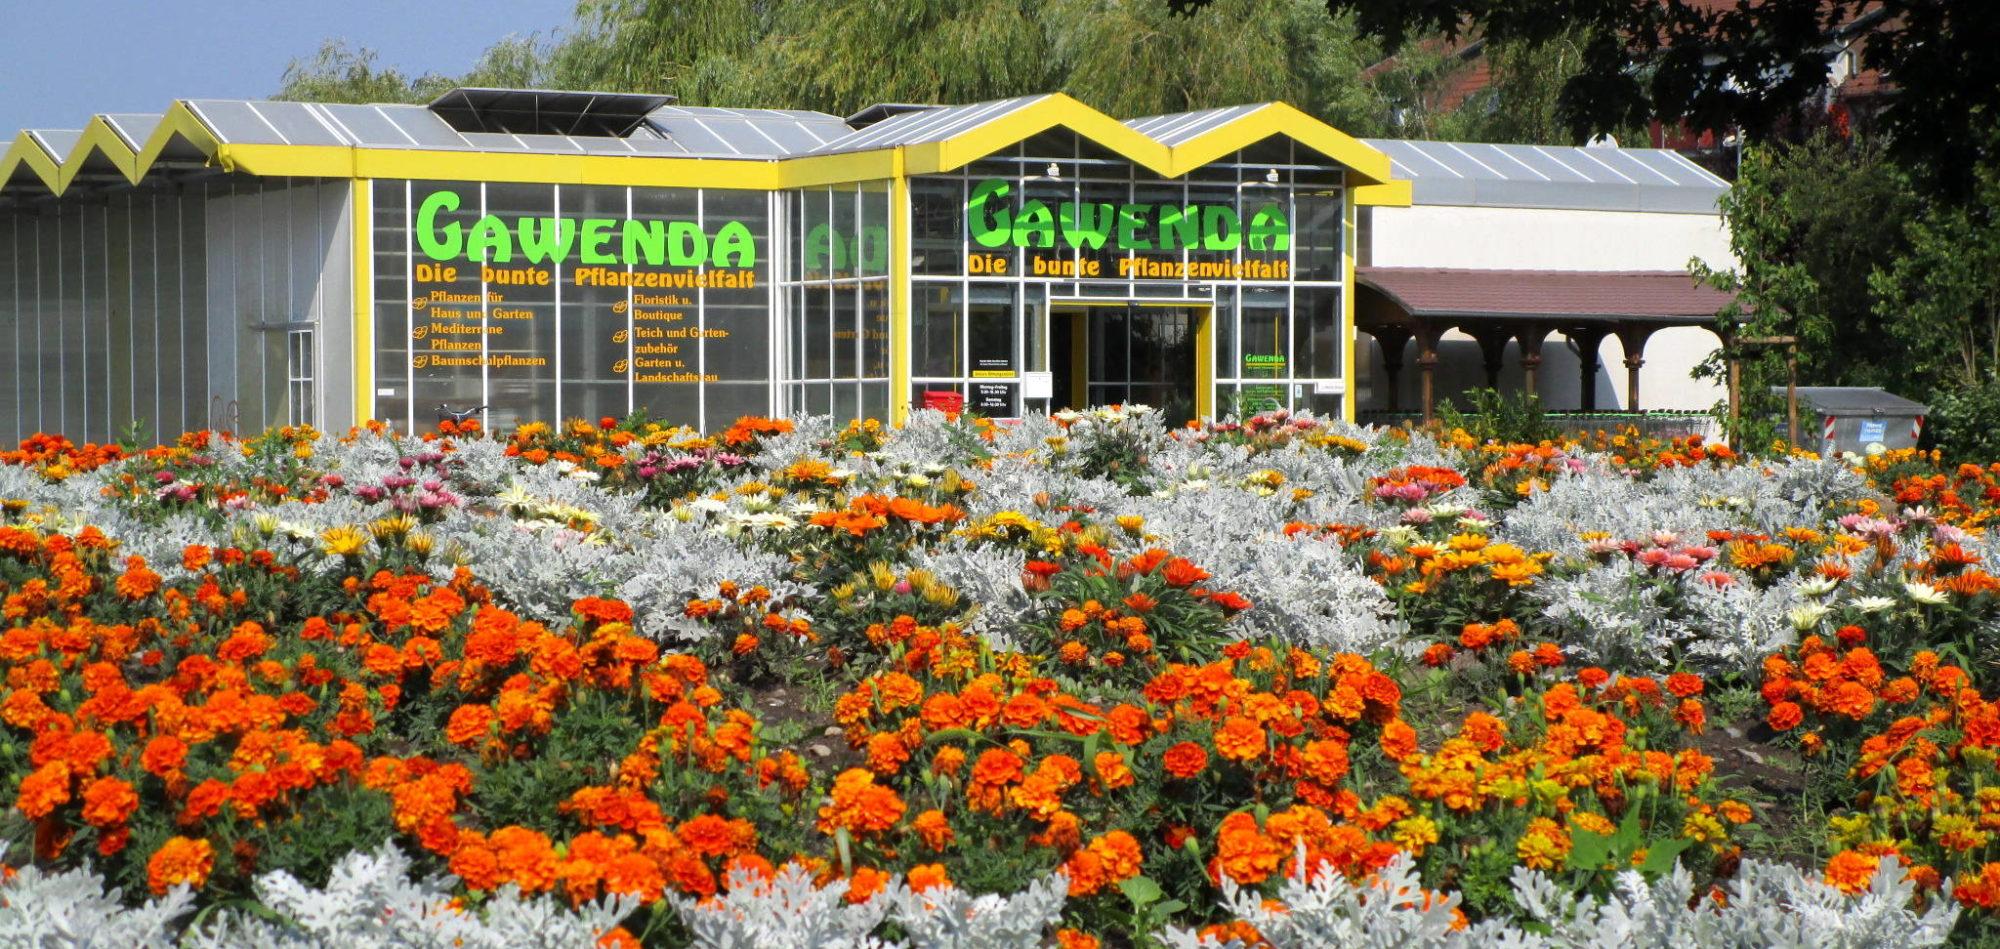 Gawenda GaHa Gartenbau und Handels GmbH